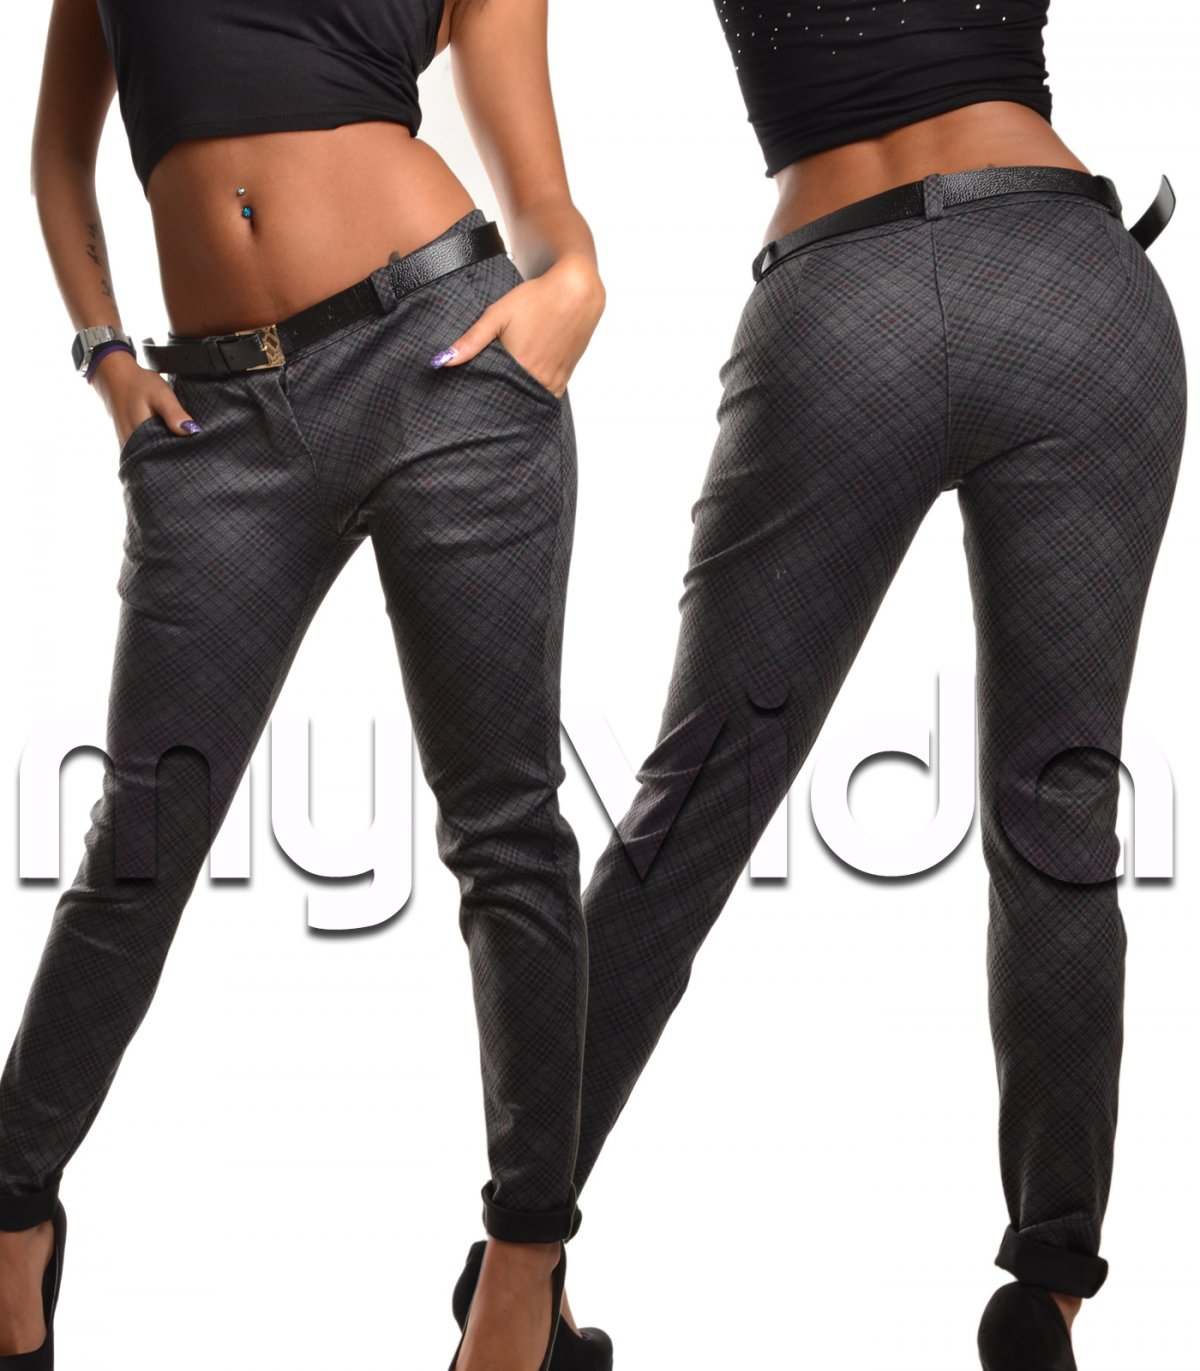 c09ca105fe86 Pantaloni eleganti donna slim fit